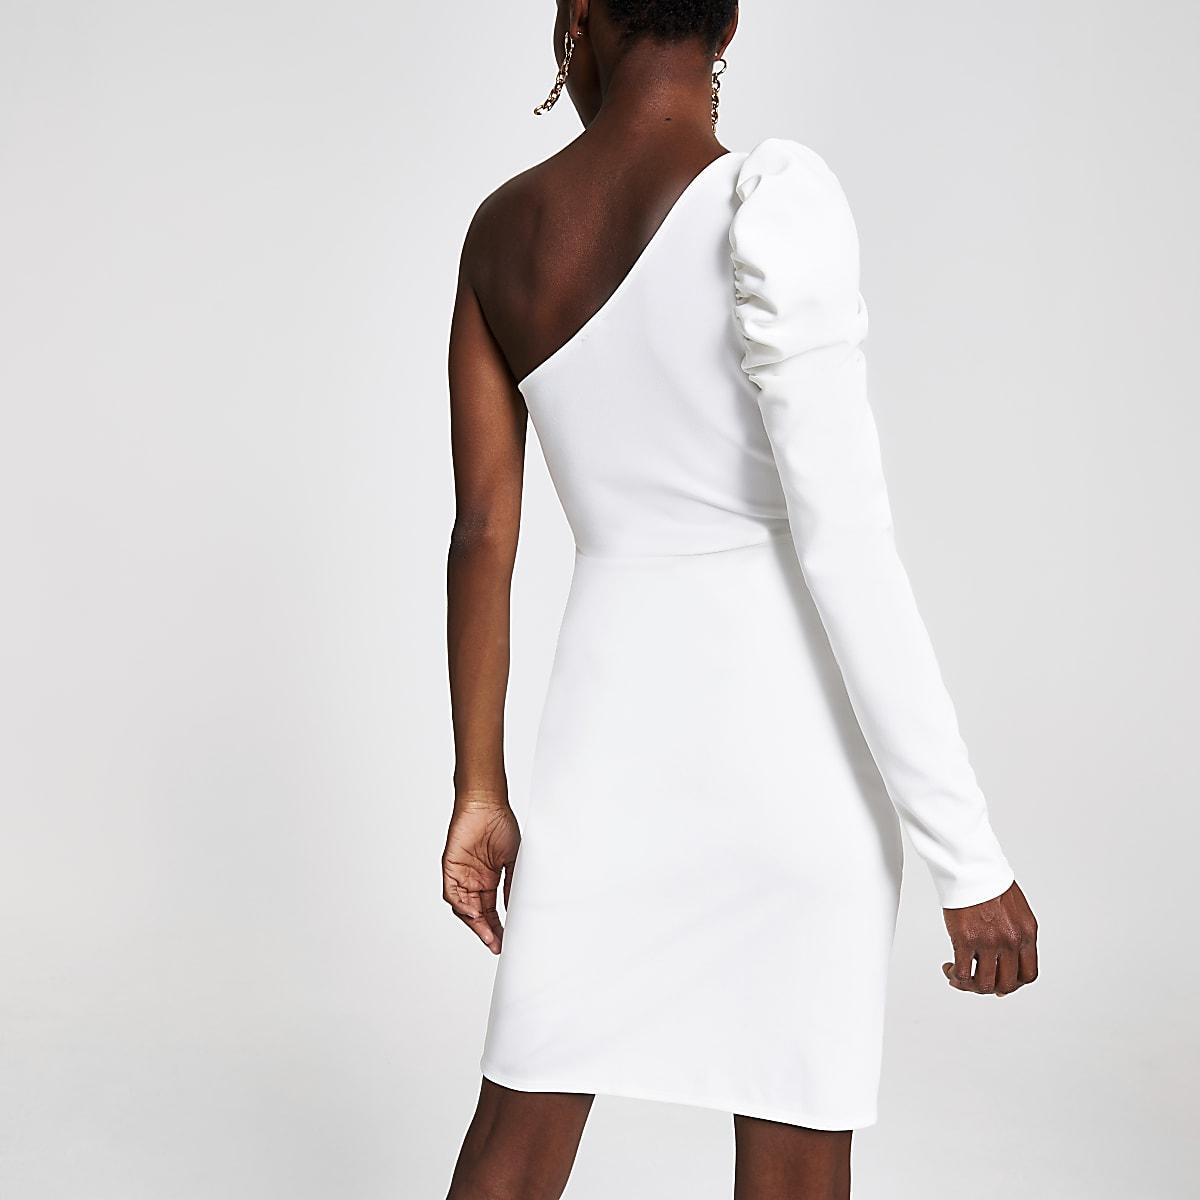 e218dccbd White one shoulder bodycon dress - Bodycon Dresses - Dresses - women